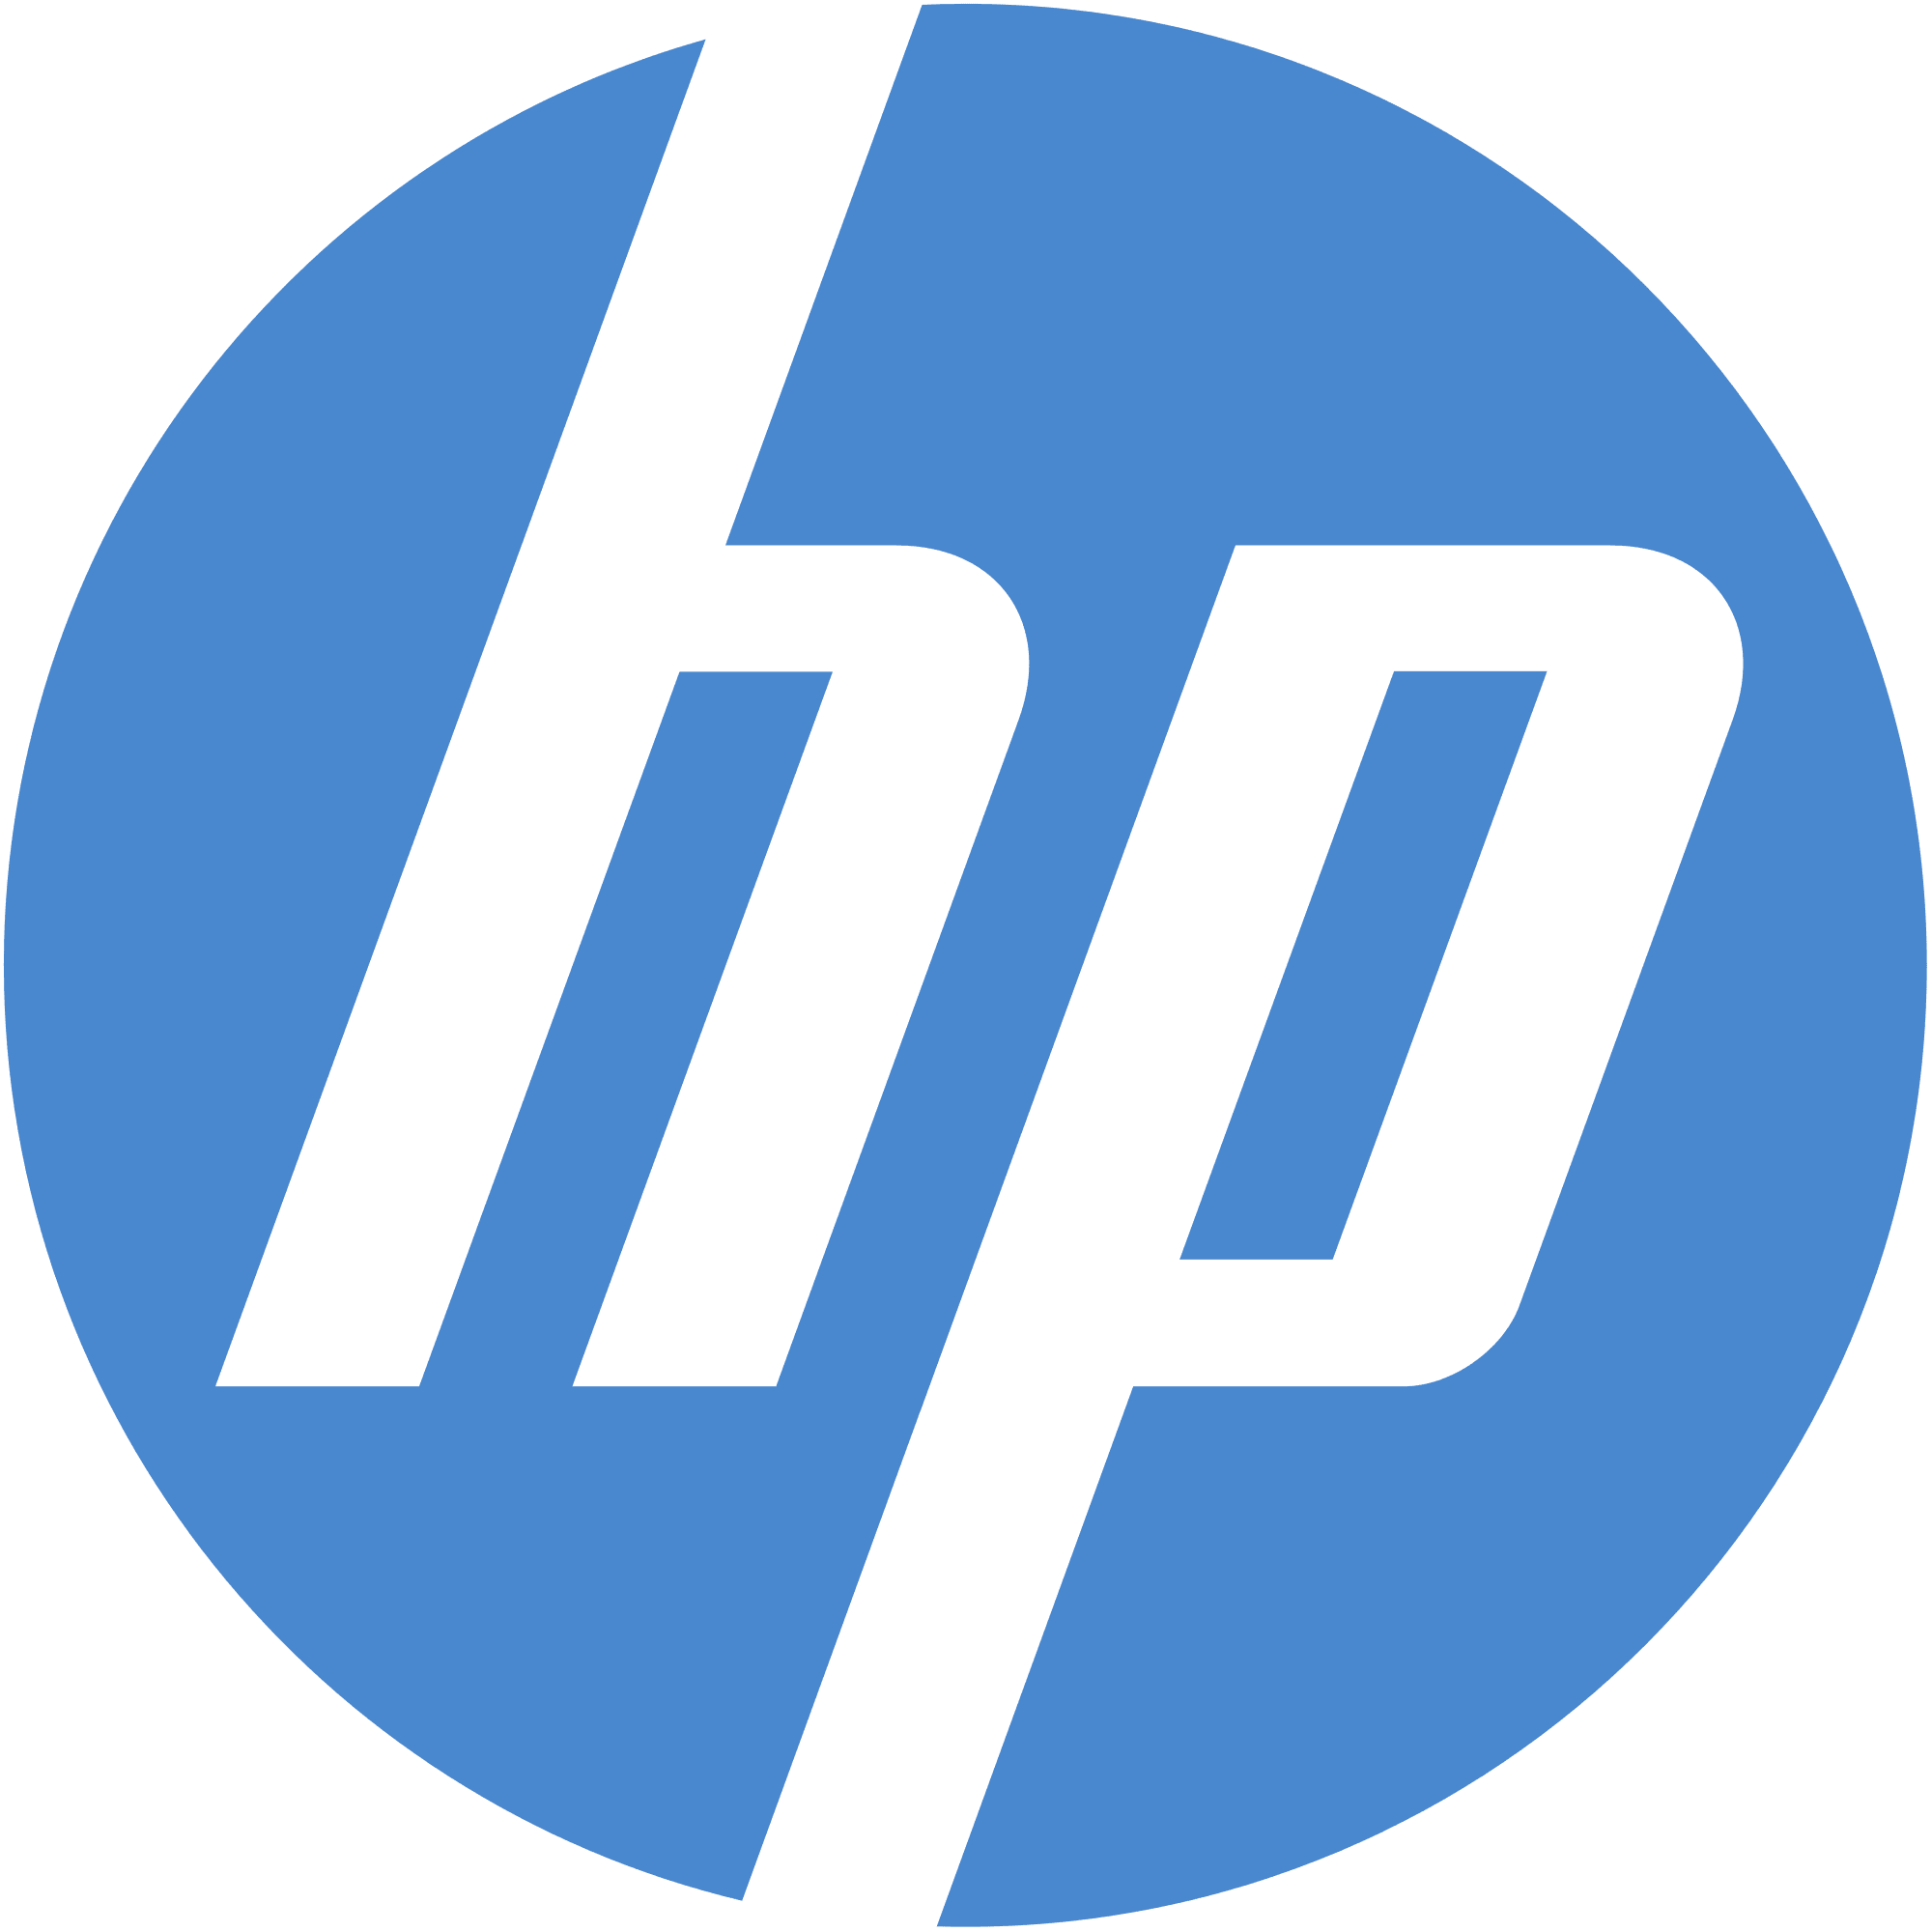 HP Officejet 150 Mobile Printer L511a drivers